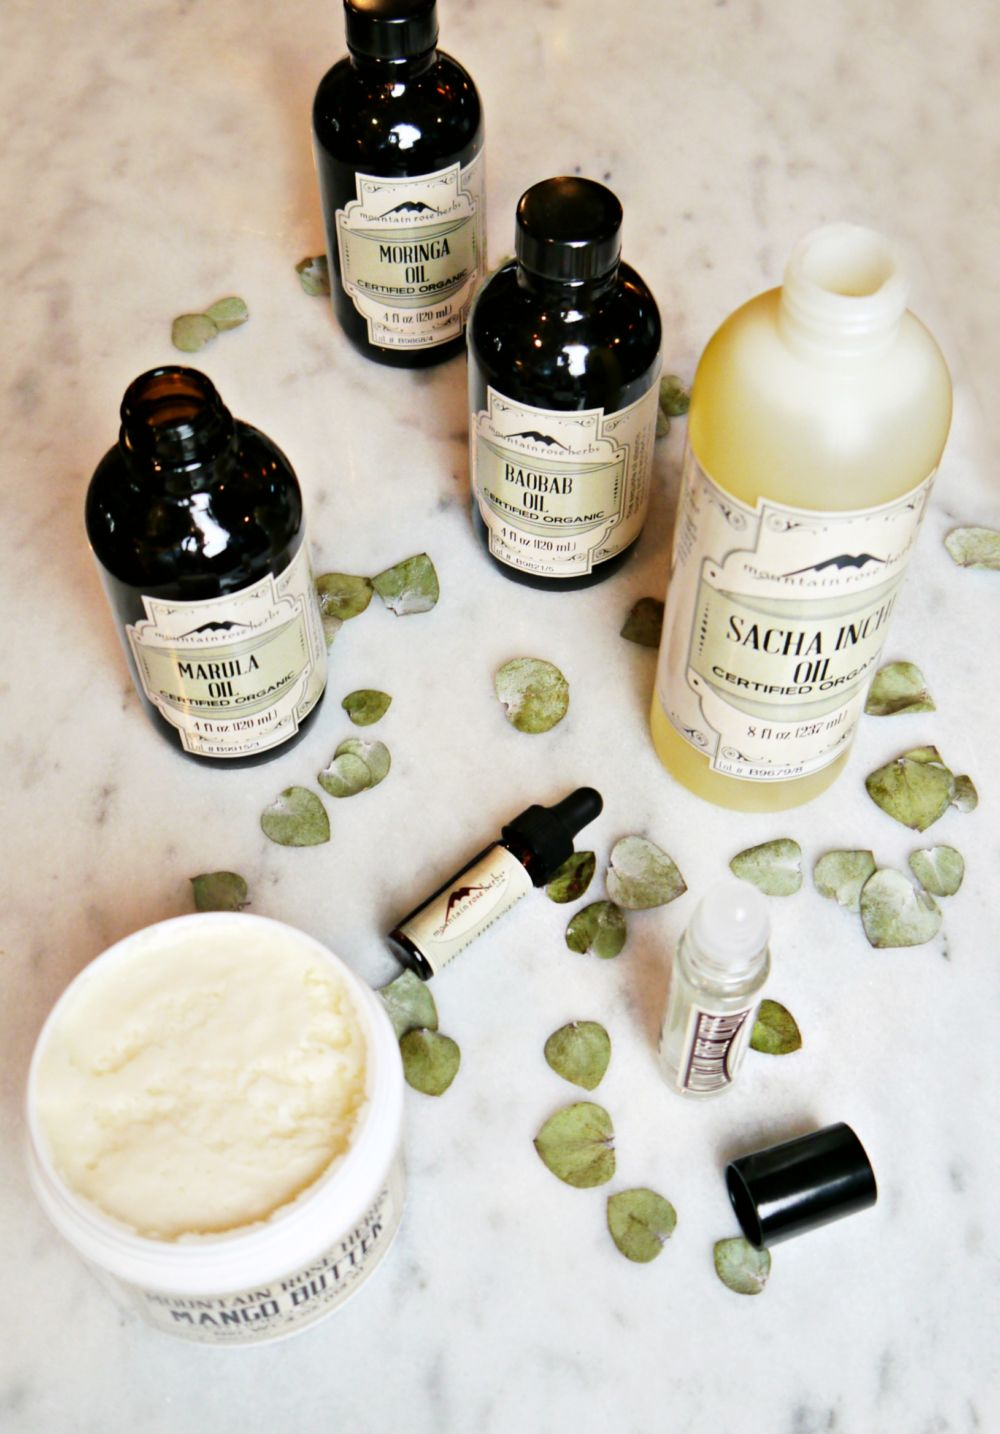 Mountain Rose herbs carrier oils